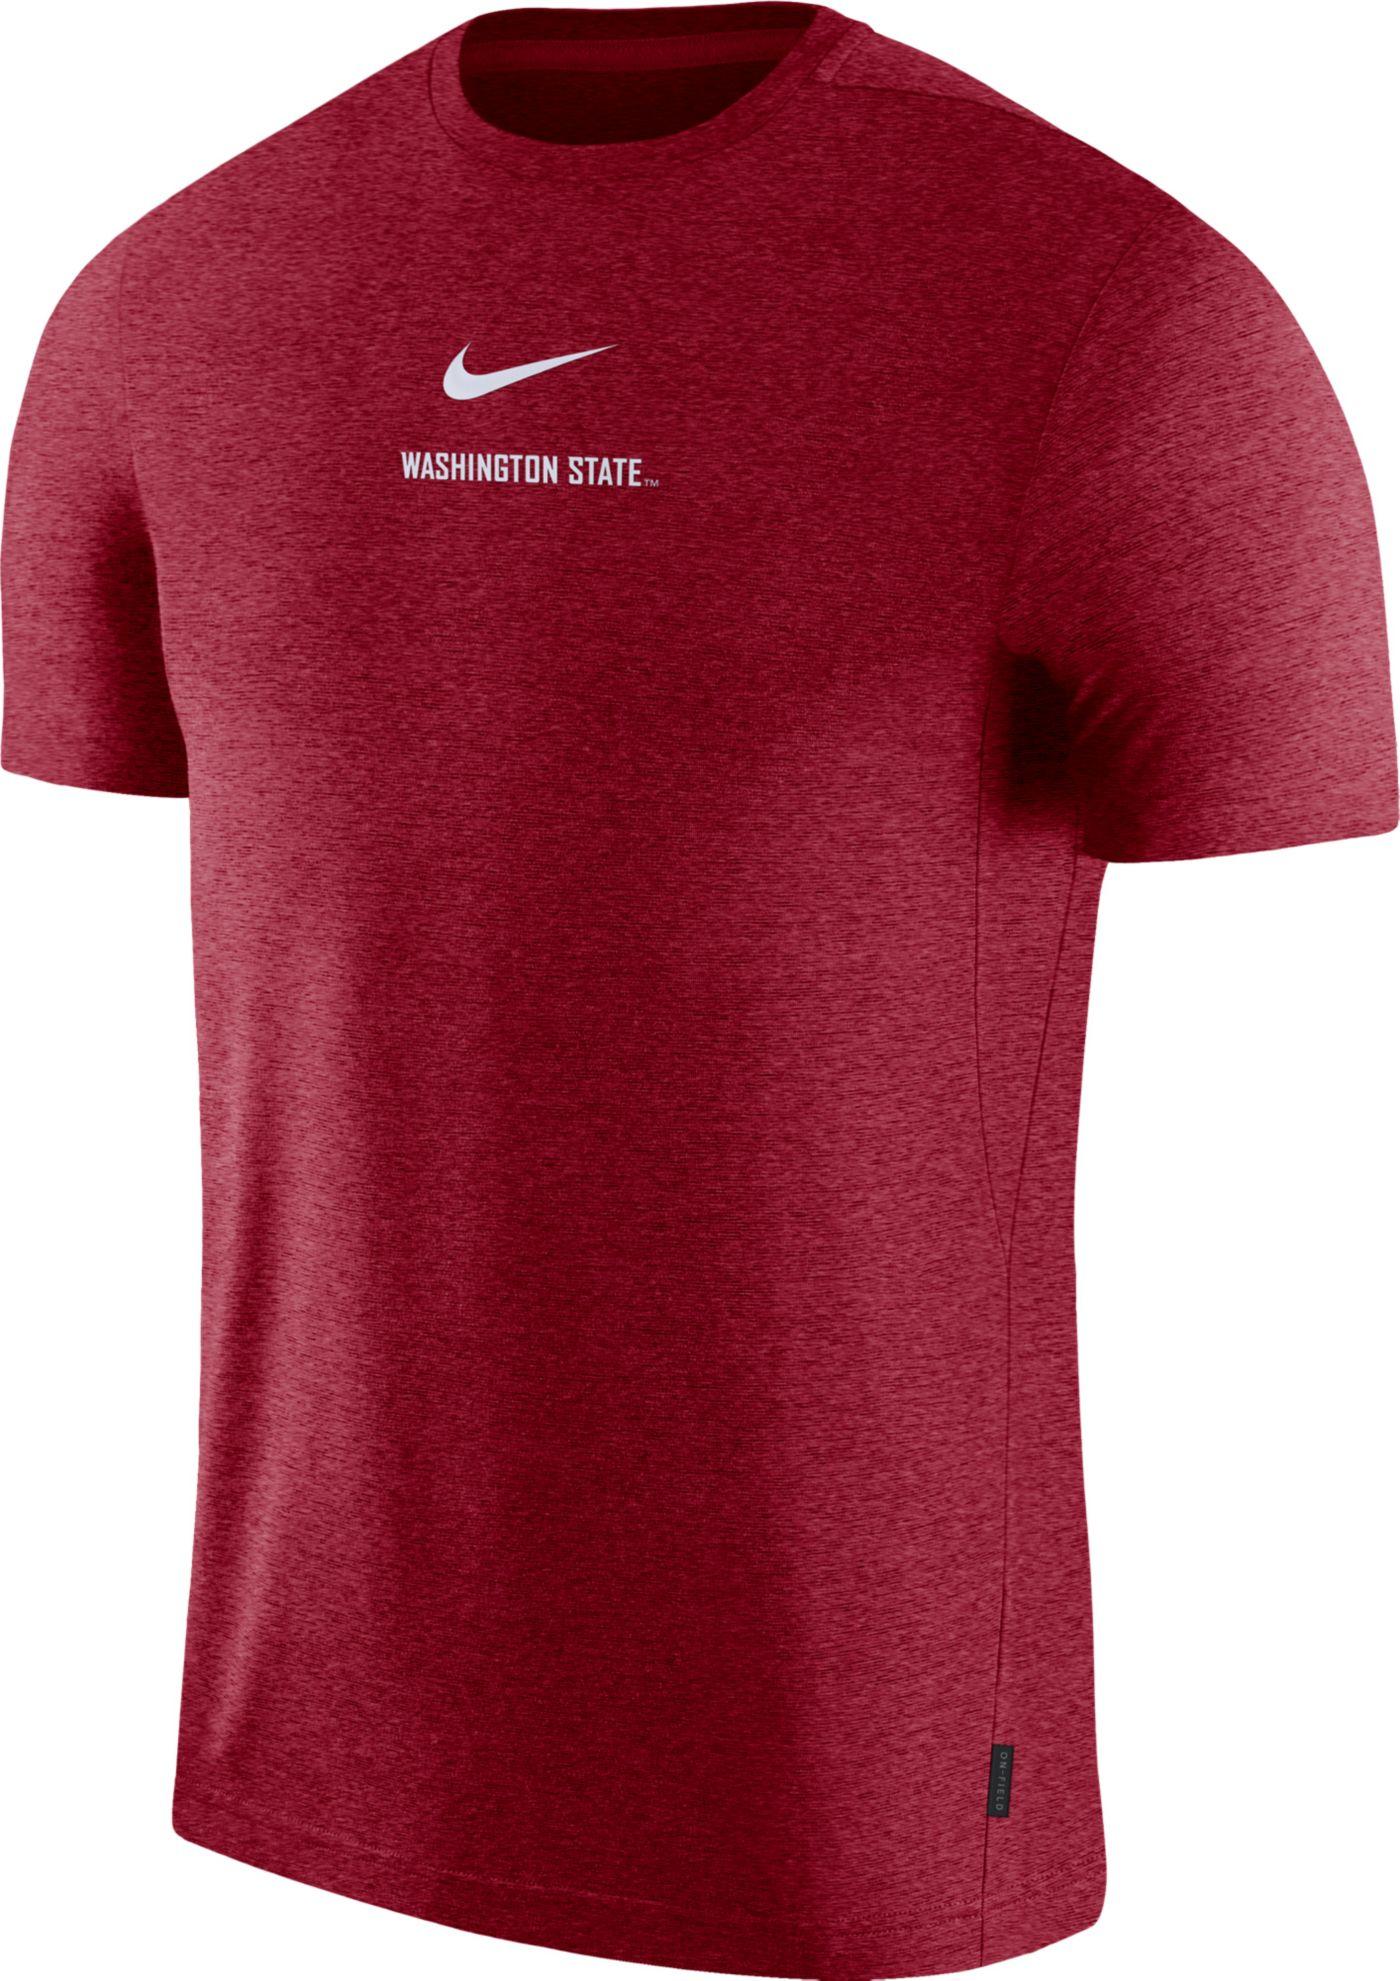 Nike Men's Washington State Cougars Crimson Dri-FIT Coach UV Football T-Shirt